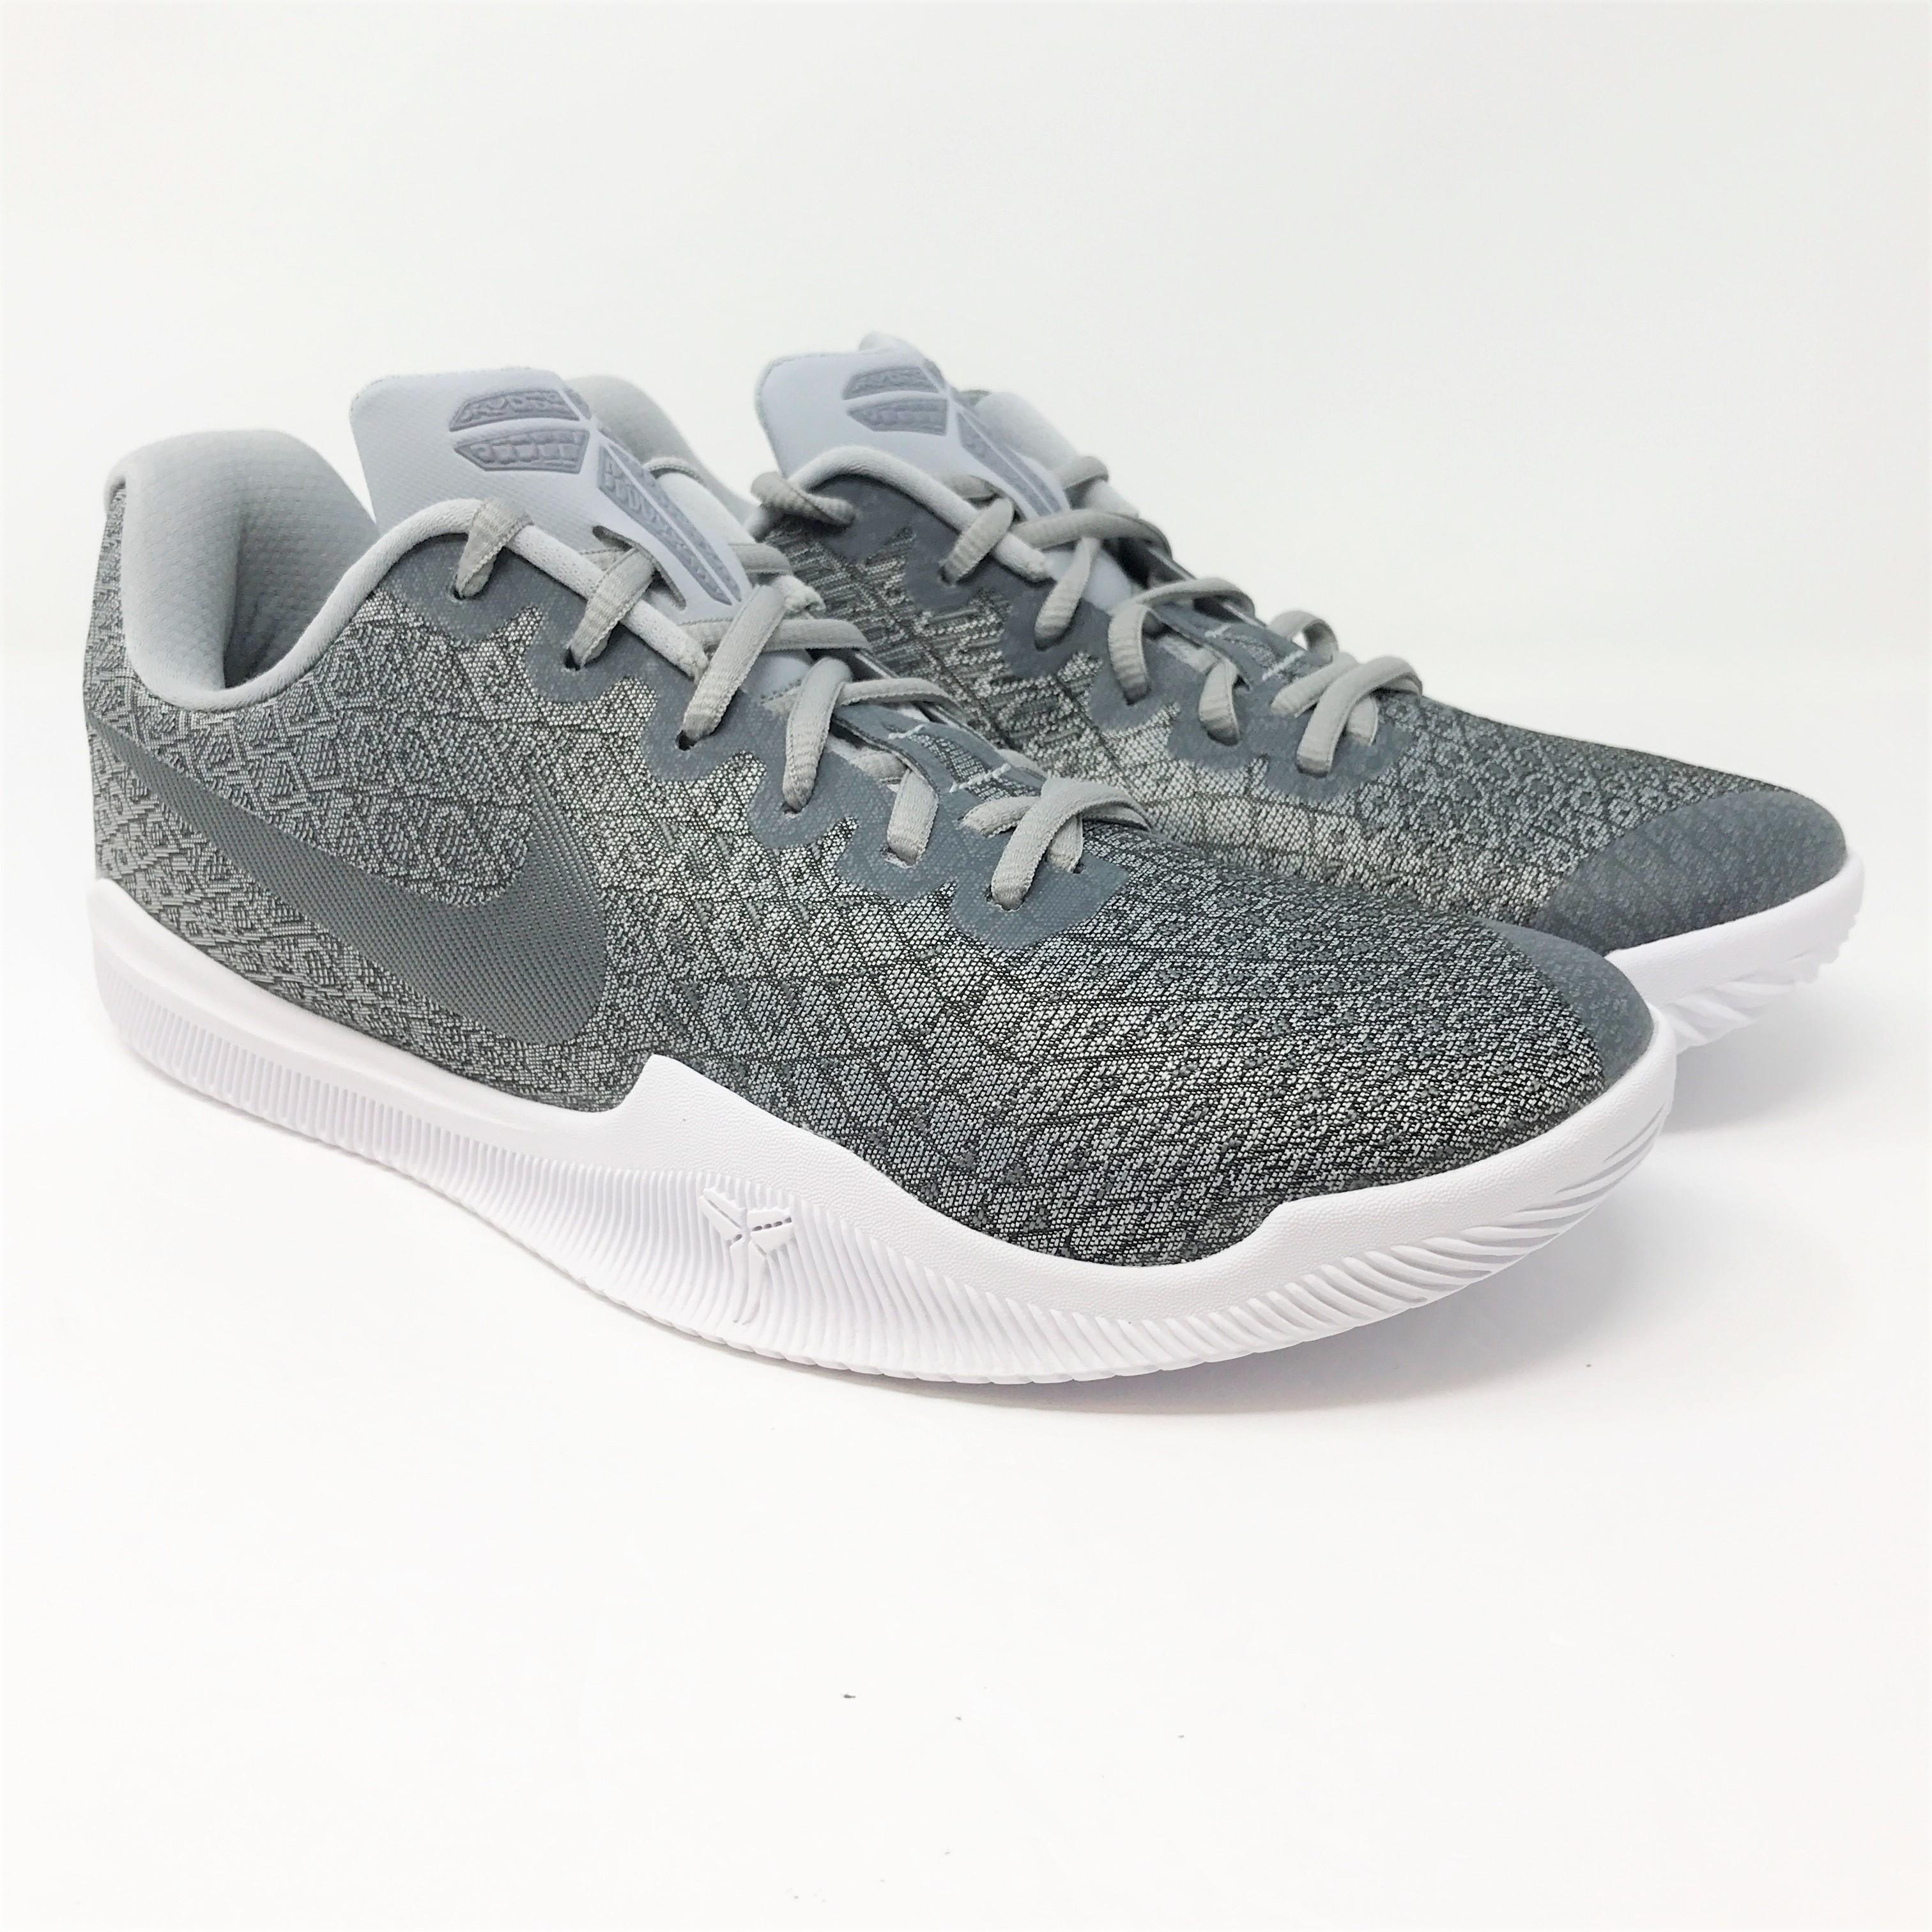 95e4cb6f81b4 Nike Mamba Instinct Men s US Size 8.5 Pure Platinum Basketball Shoes ...